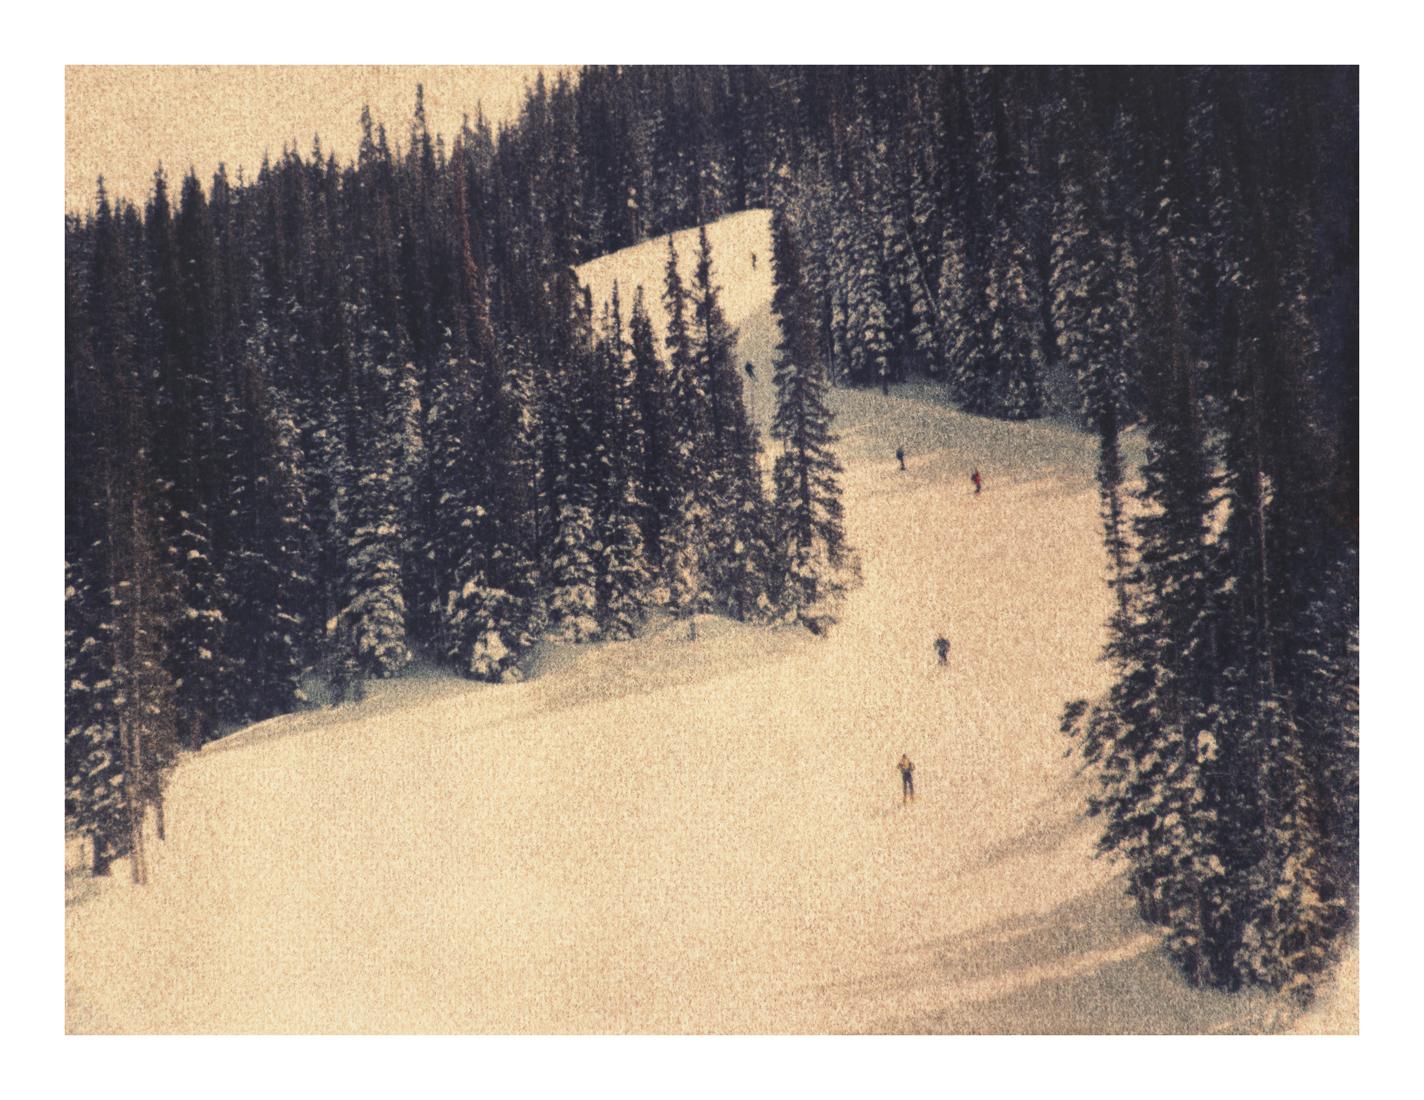 Aspen #19, 2013 (1996)